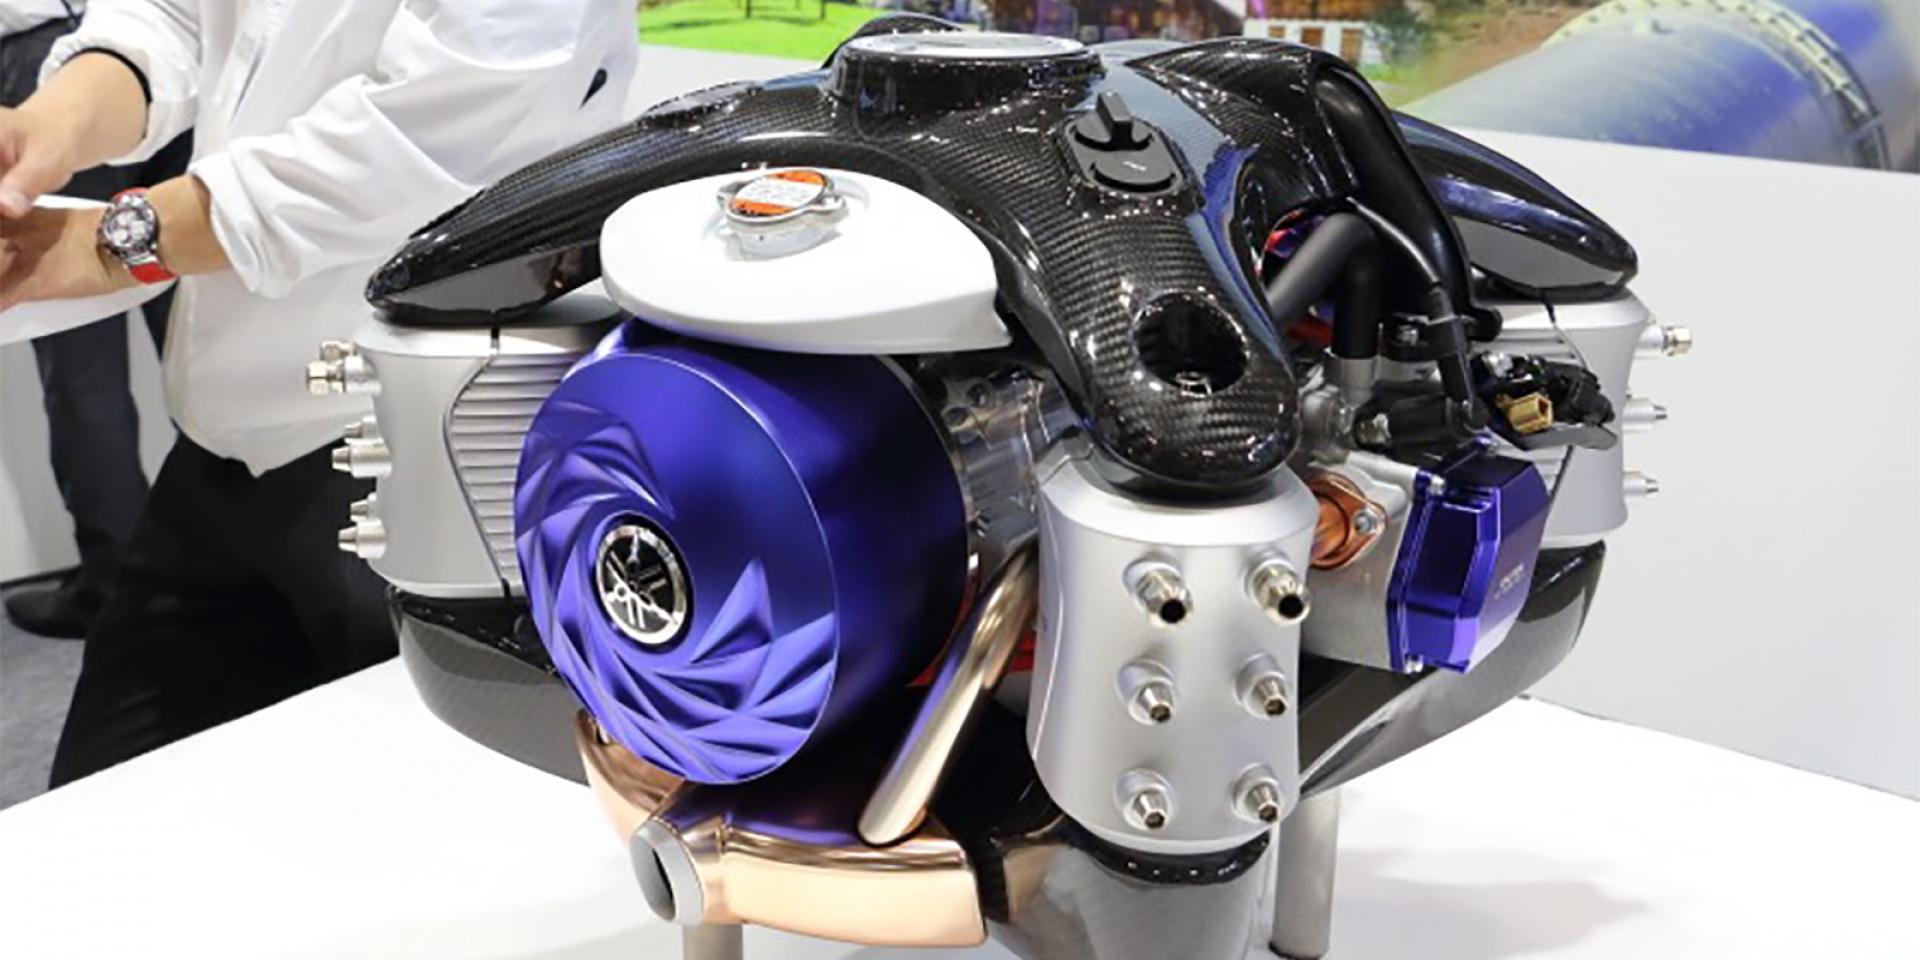 YAMAHA亮相無人機用水平對臥引擎發電機,未來有望運用在二輪車款上